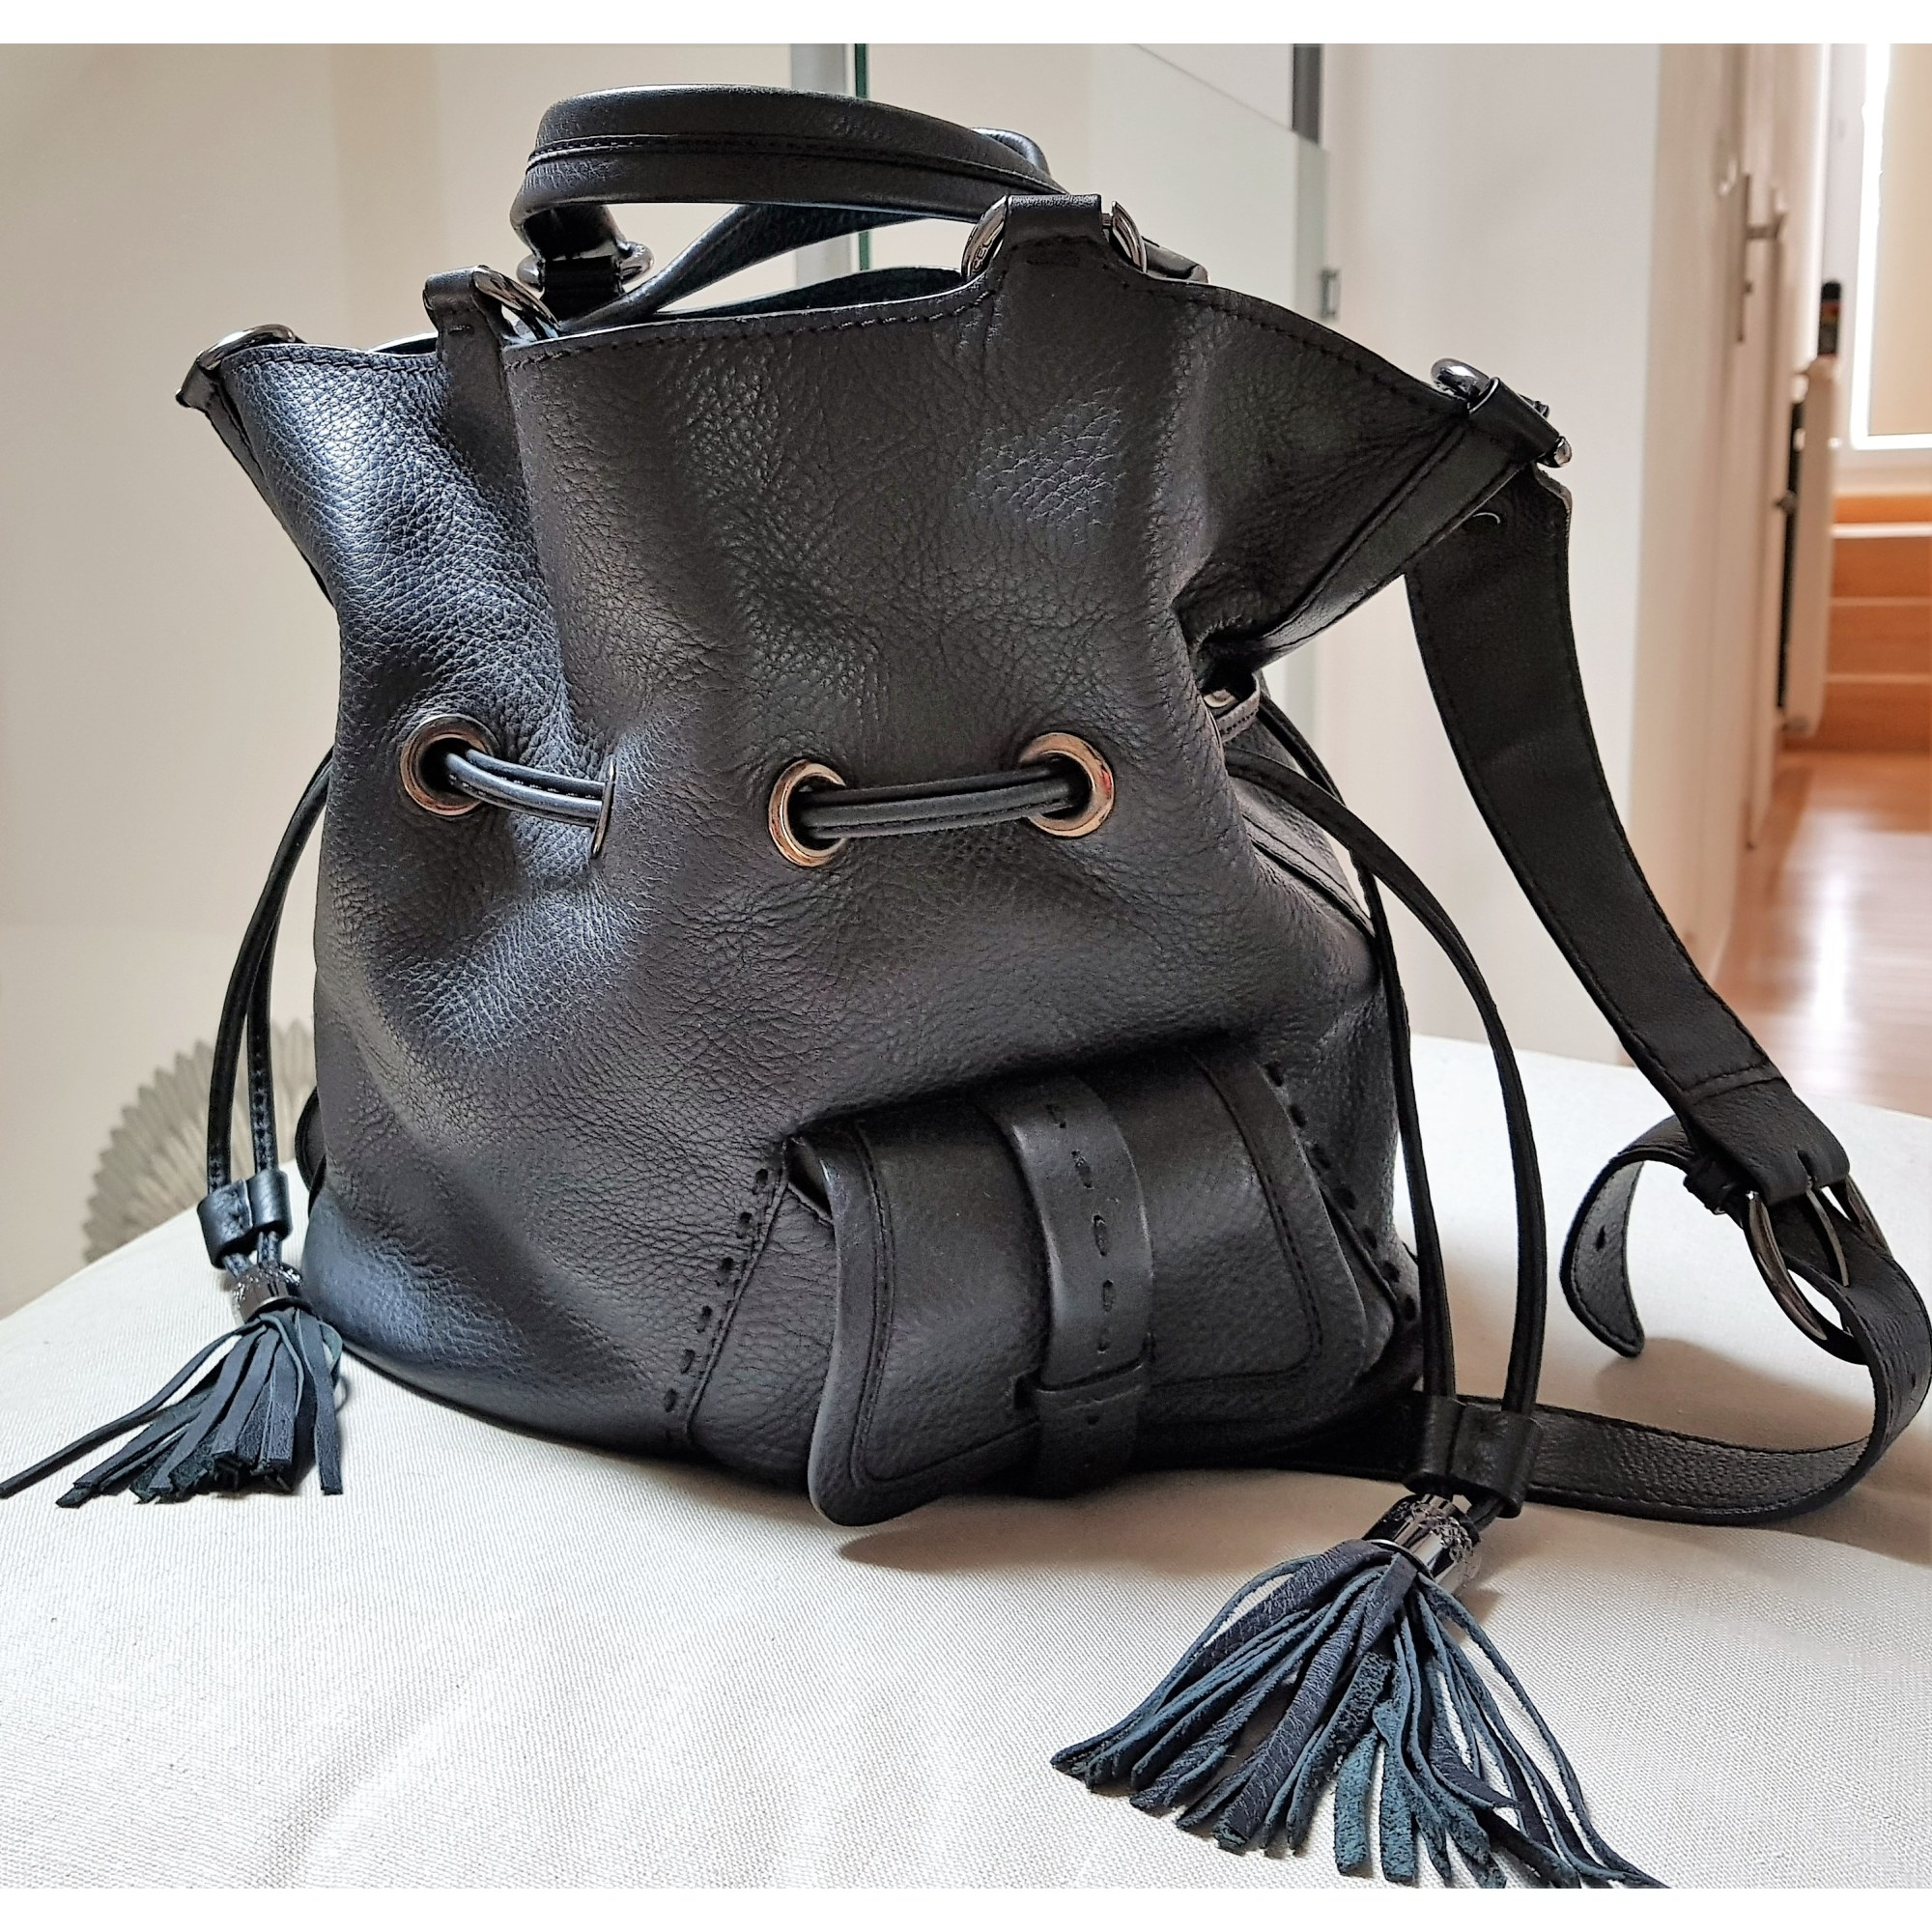 7989b7ed044 Sac à main en cuir LANCEL 1er flirt noir vendu par Sabine 24291689 ...